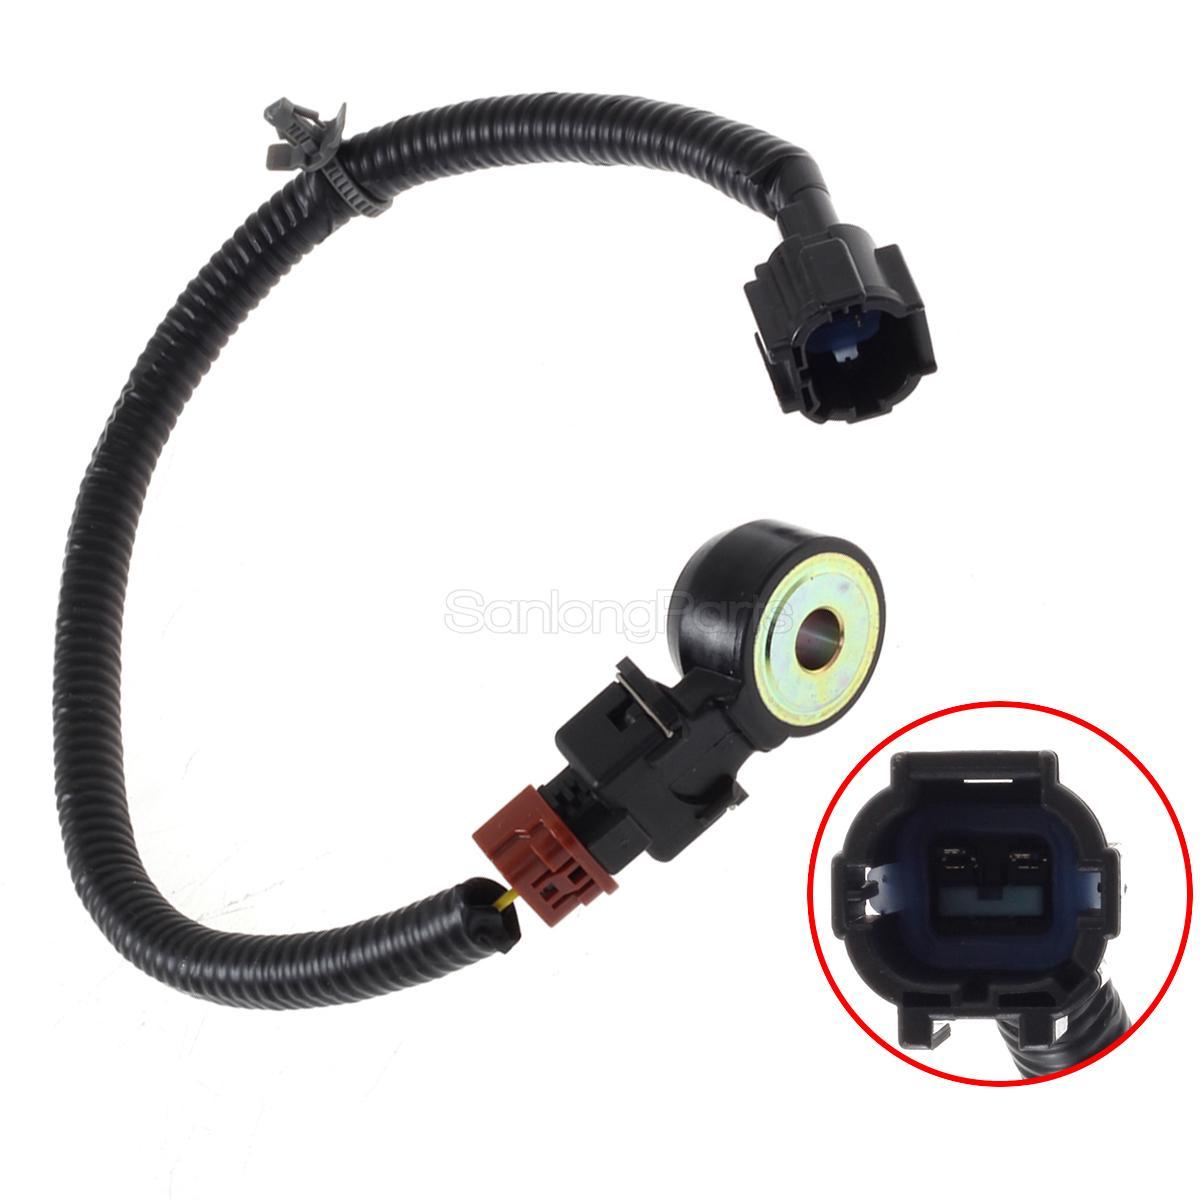 knock sensor wiring harness for nissan 22060 30p00 ks79